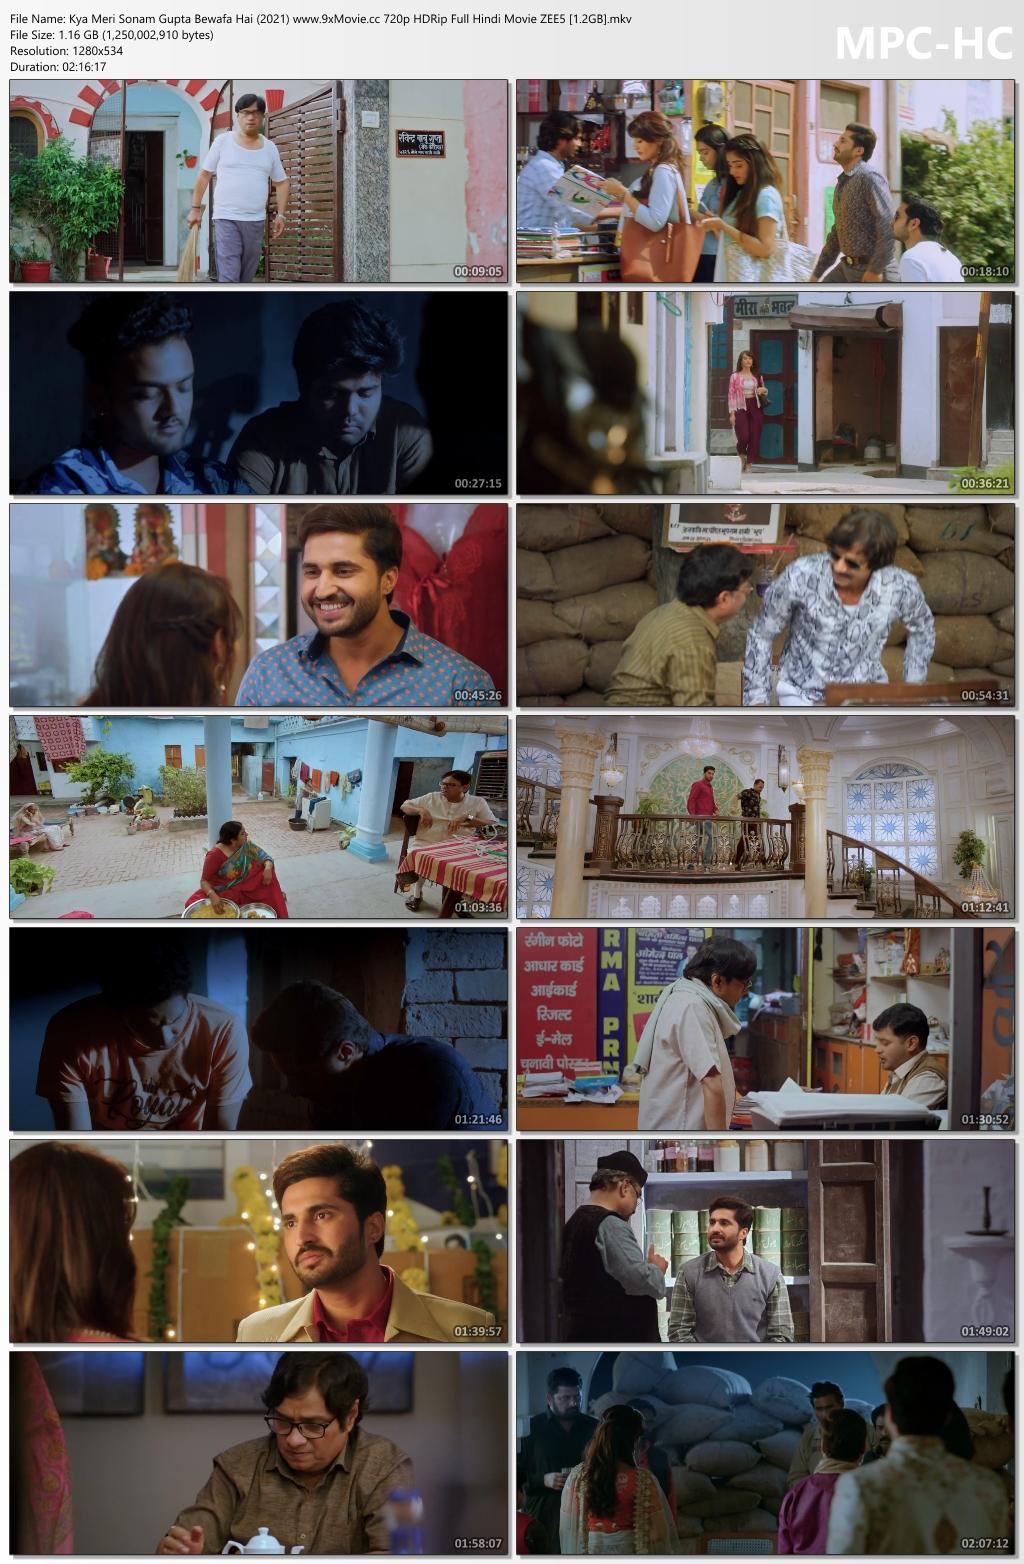 Kya-Meri-Sonam-Gupta-Bewafa-Hai-2021-www-9x-Movie-cc-720p-HDRip-Full-Hindi-Movie-ZEE5-1-2-GB-mkv